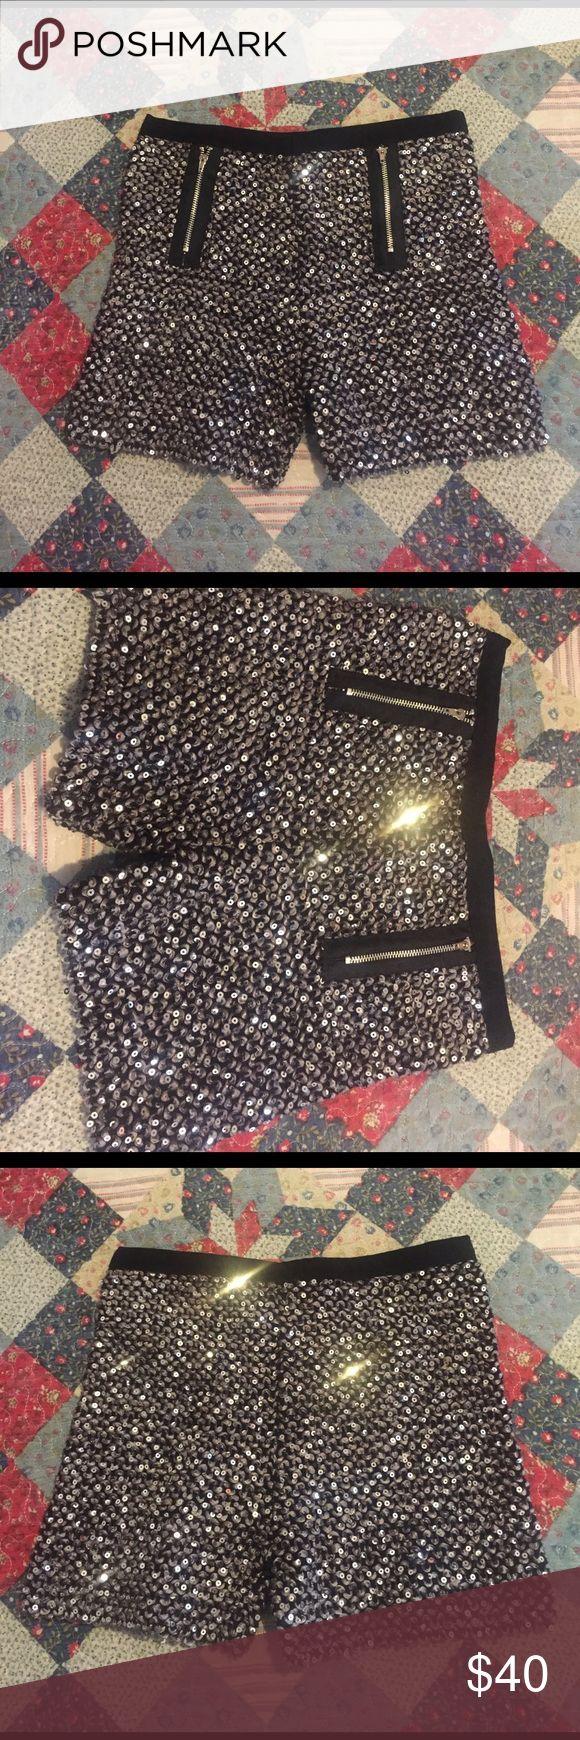 Sparkly shorts ... Shorts